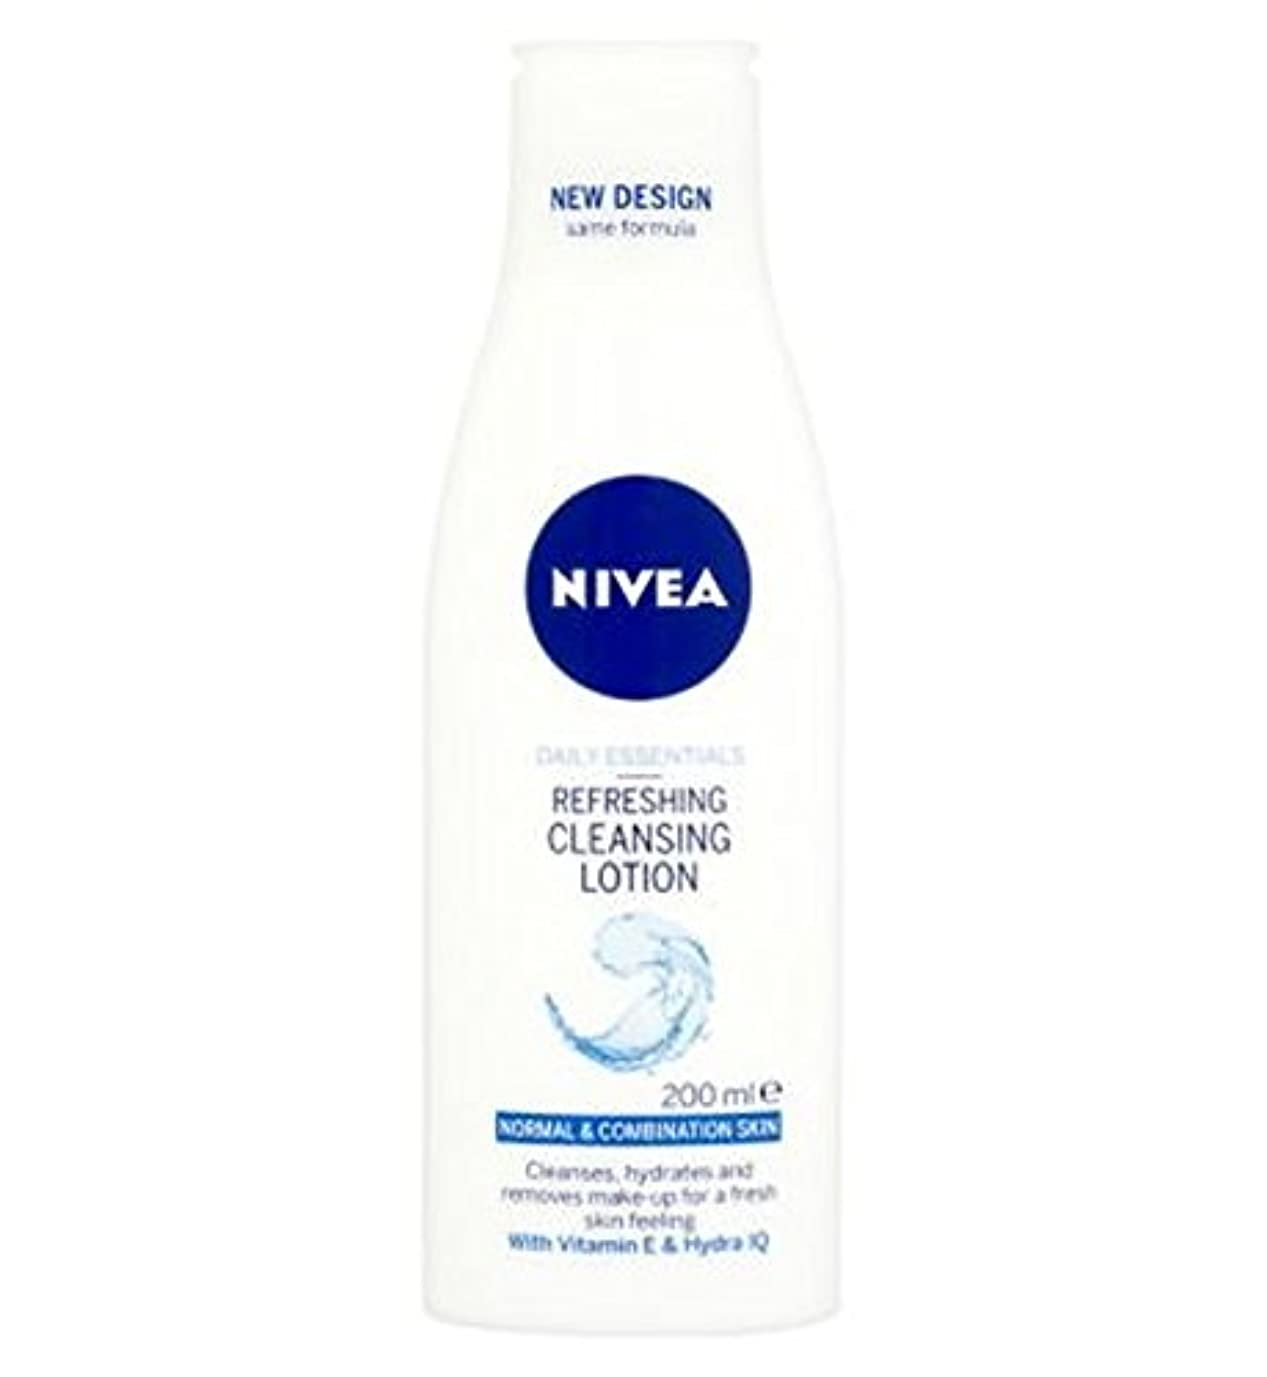 Nivea Daily Essentials Refreshing Cleansing Lotion For Normal to Combination Skin 200ml - 混合肌の200ミリリットルに、通常のためのクレンジングローションをリフレッシュニベア生活必需品 (Nivea) [並行輸入品]